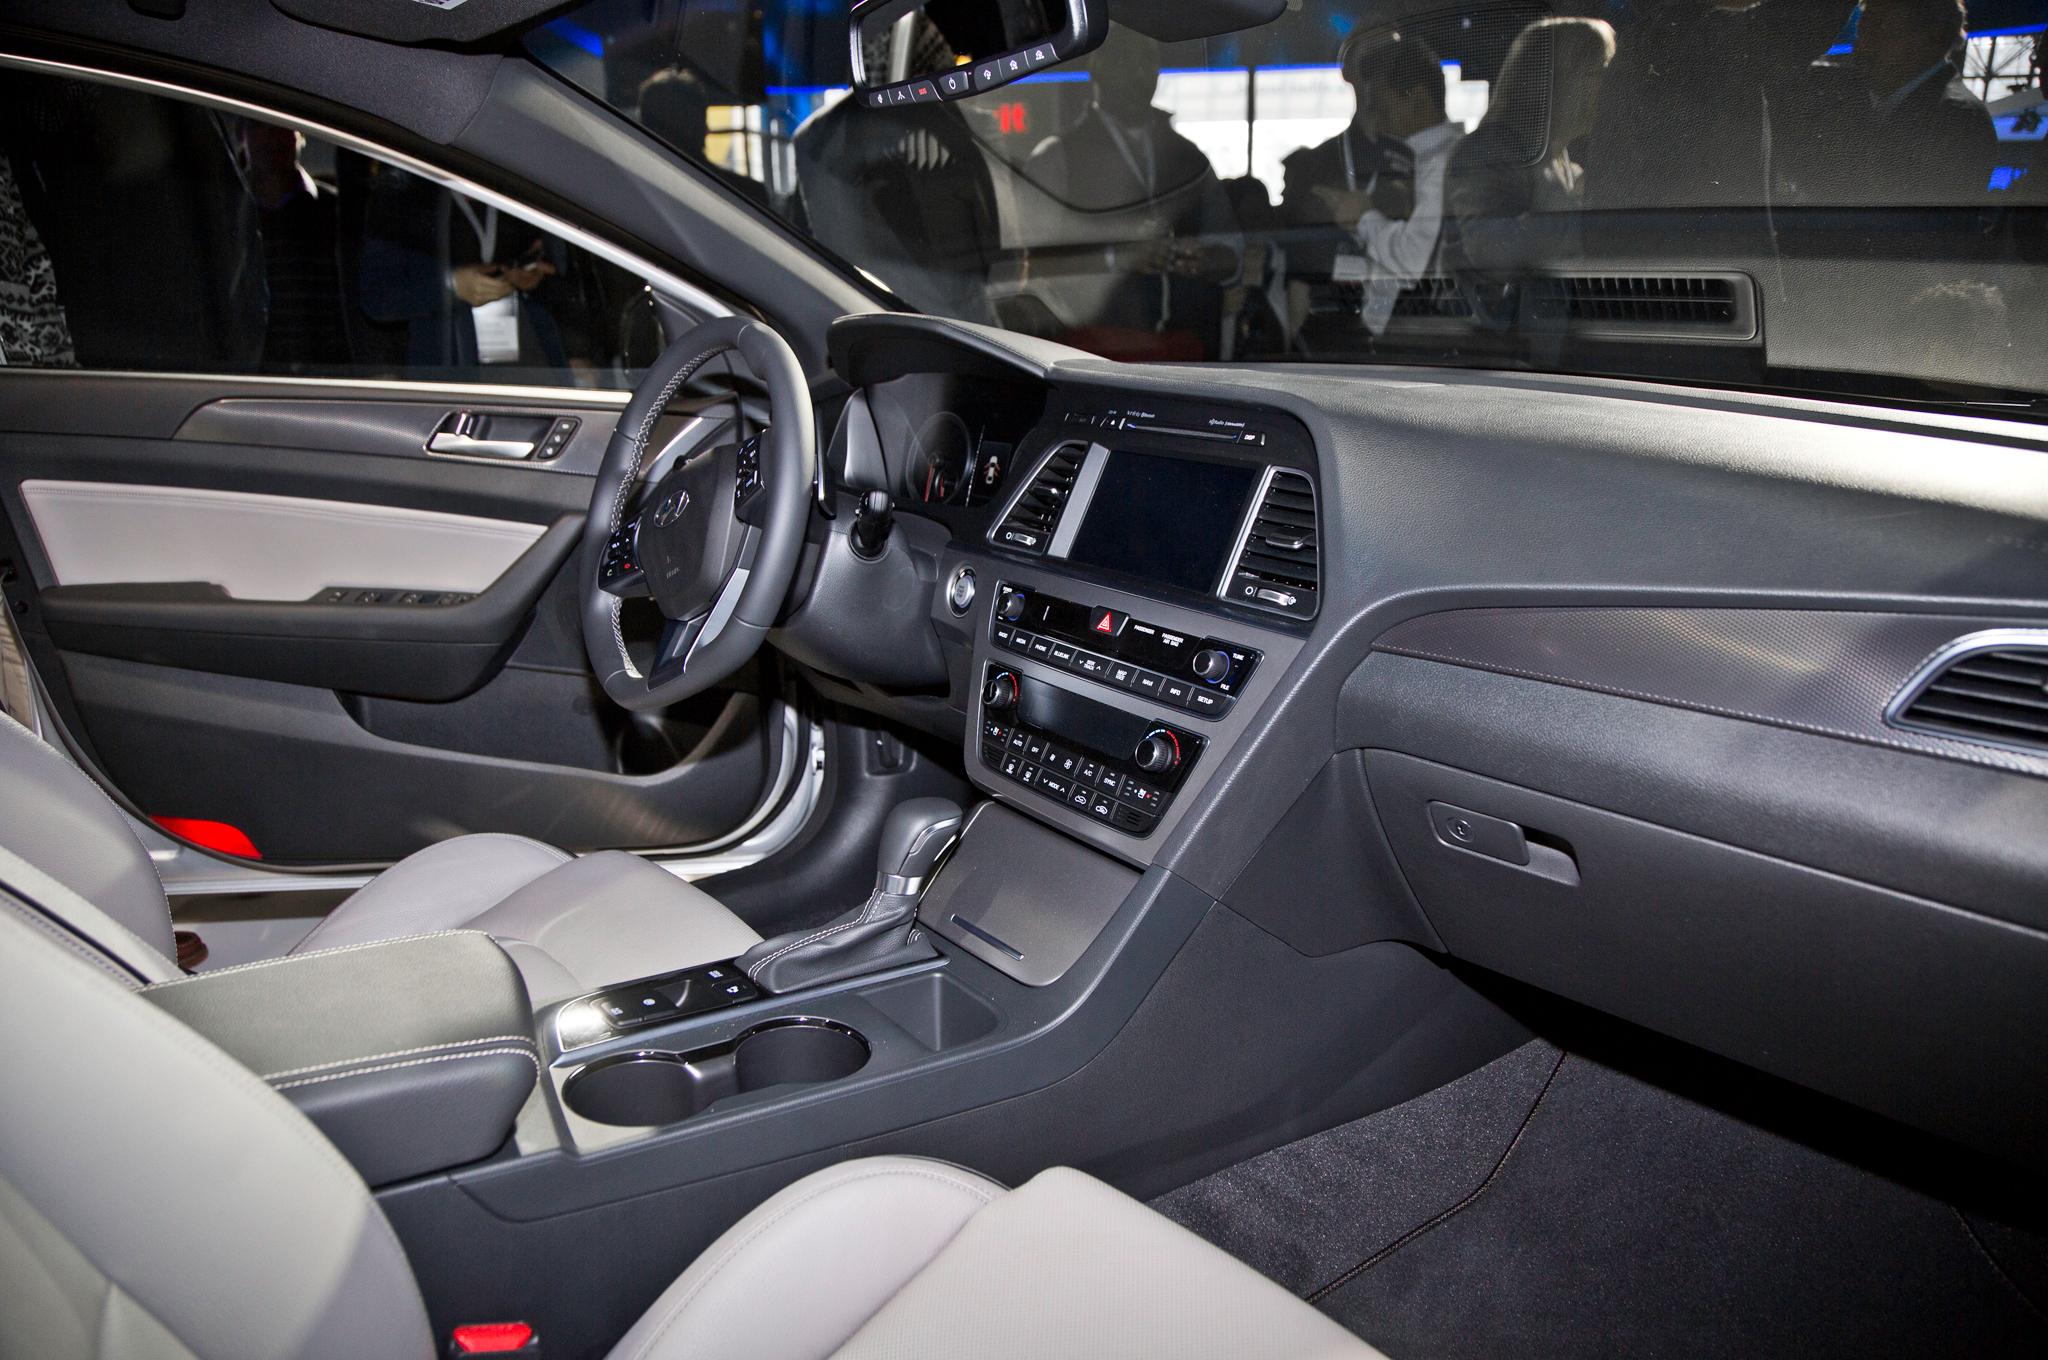 2015 Hyundai Sonata Interior Preview